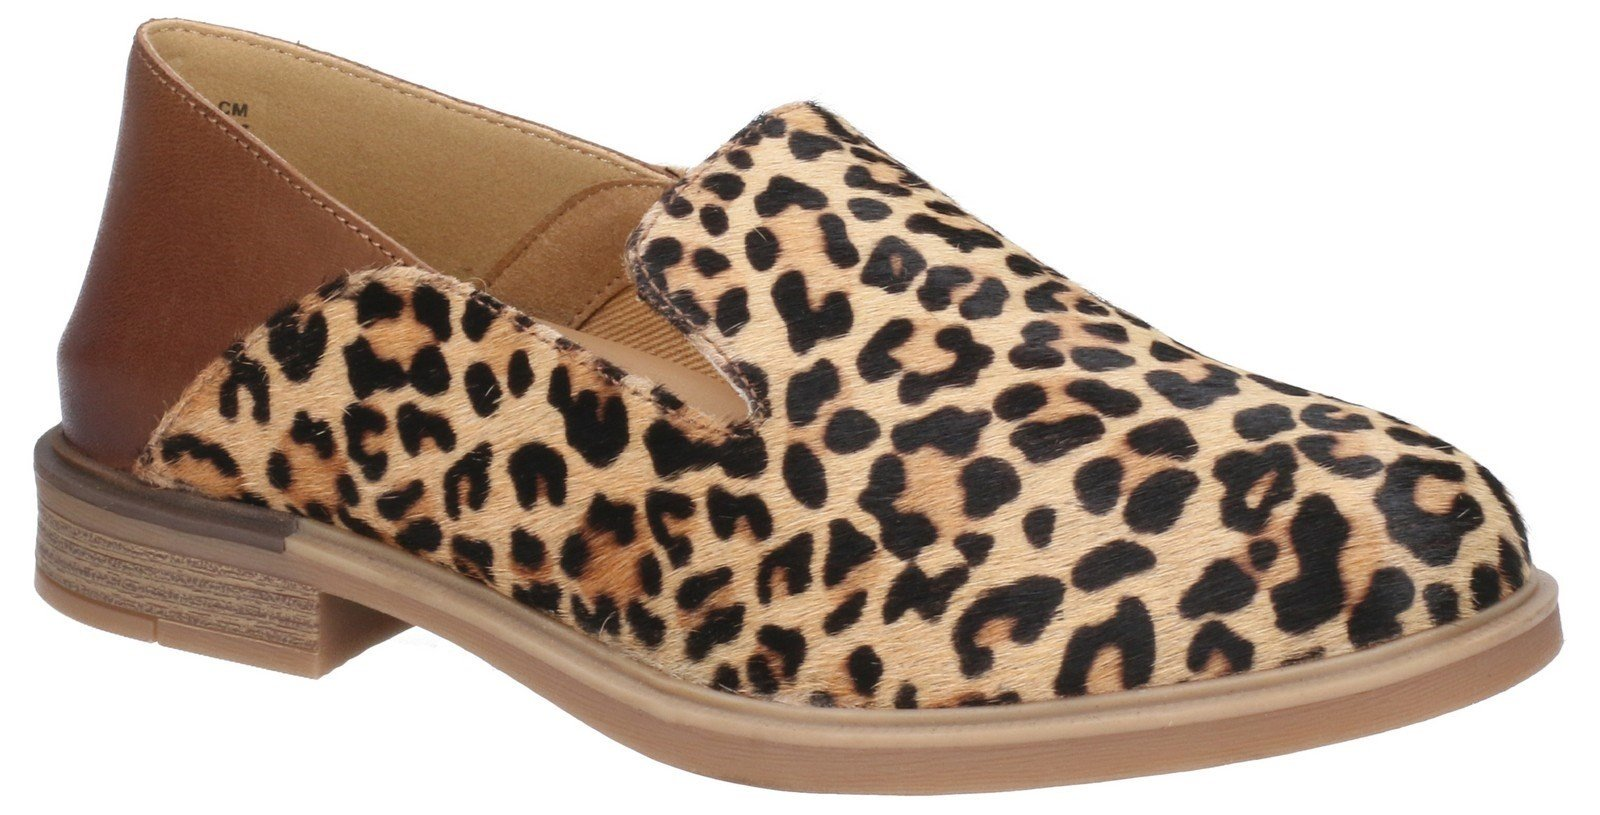 Hush Puppies Women's Bailey Bounce Slip On Flats Various Colours 29224 - Leopard Calf Hair 3